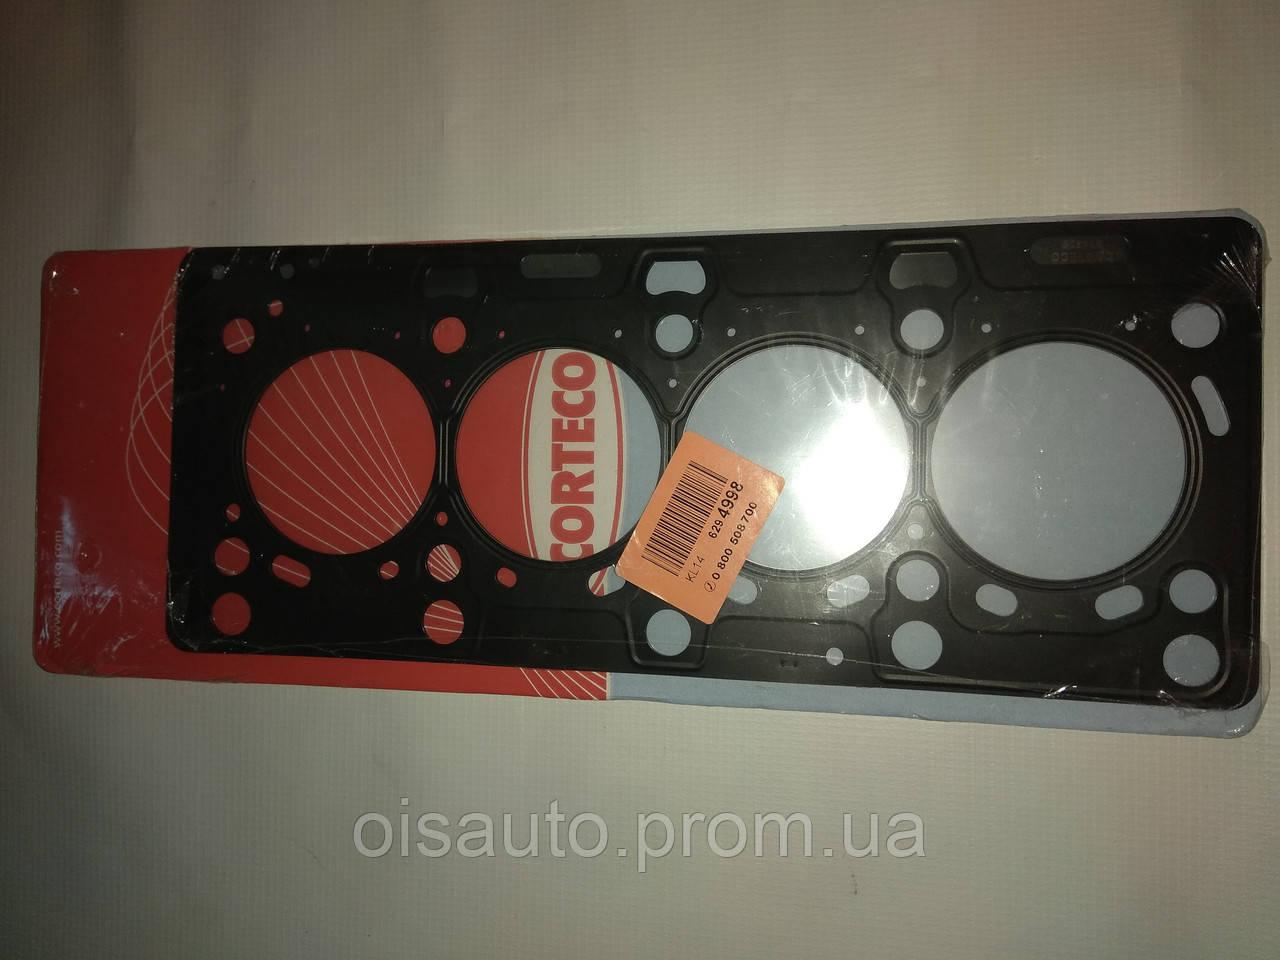 Прокладка ГБЦ CORTECO 414238P (Nissan/Kangoo 1.5dci)